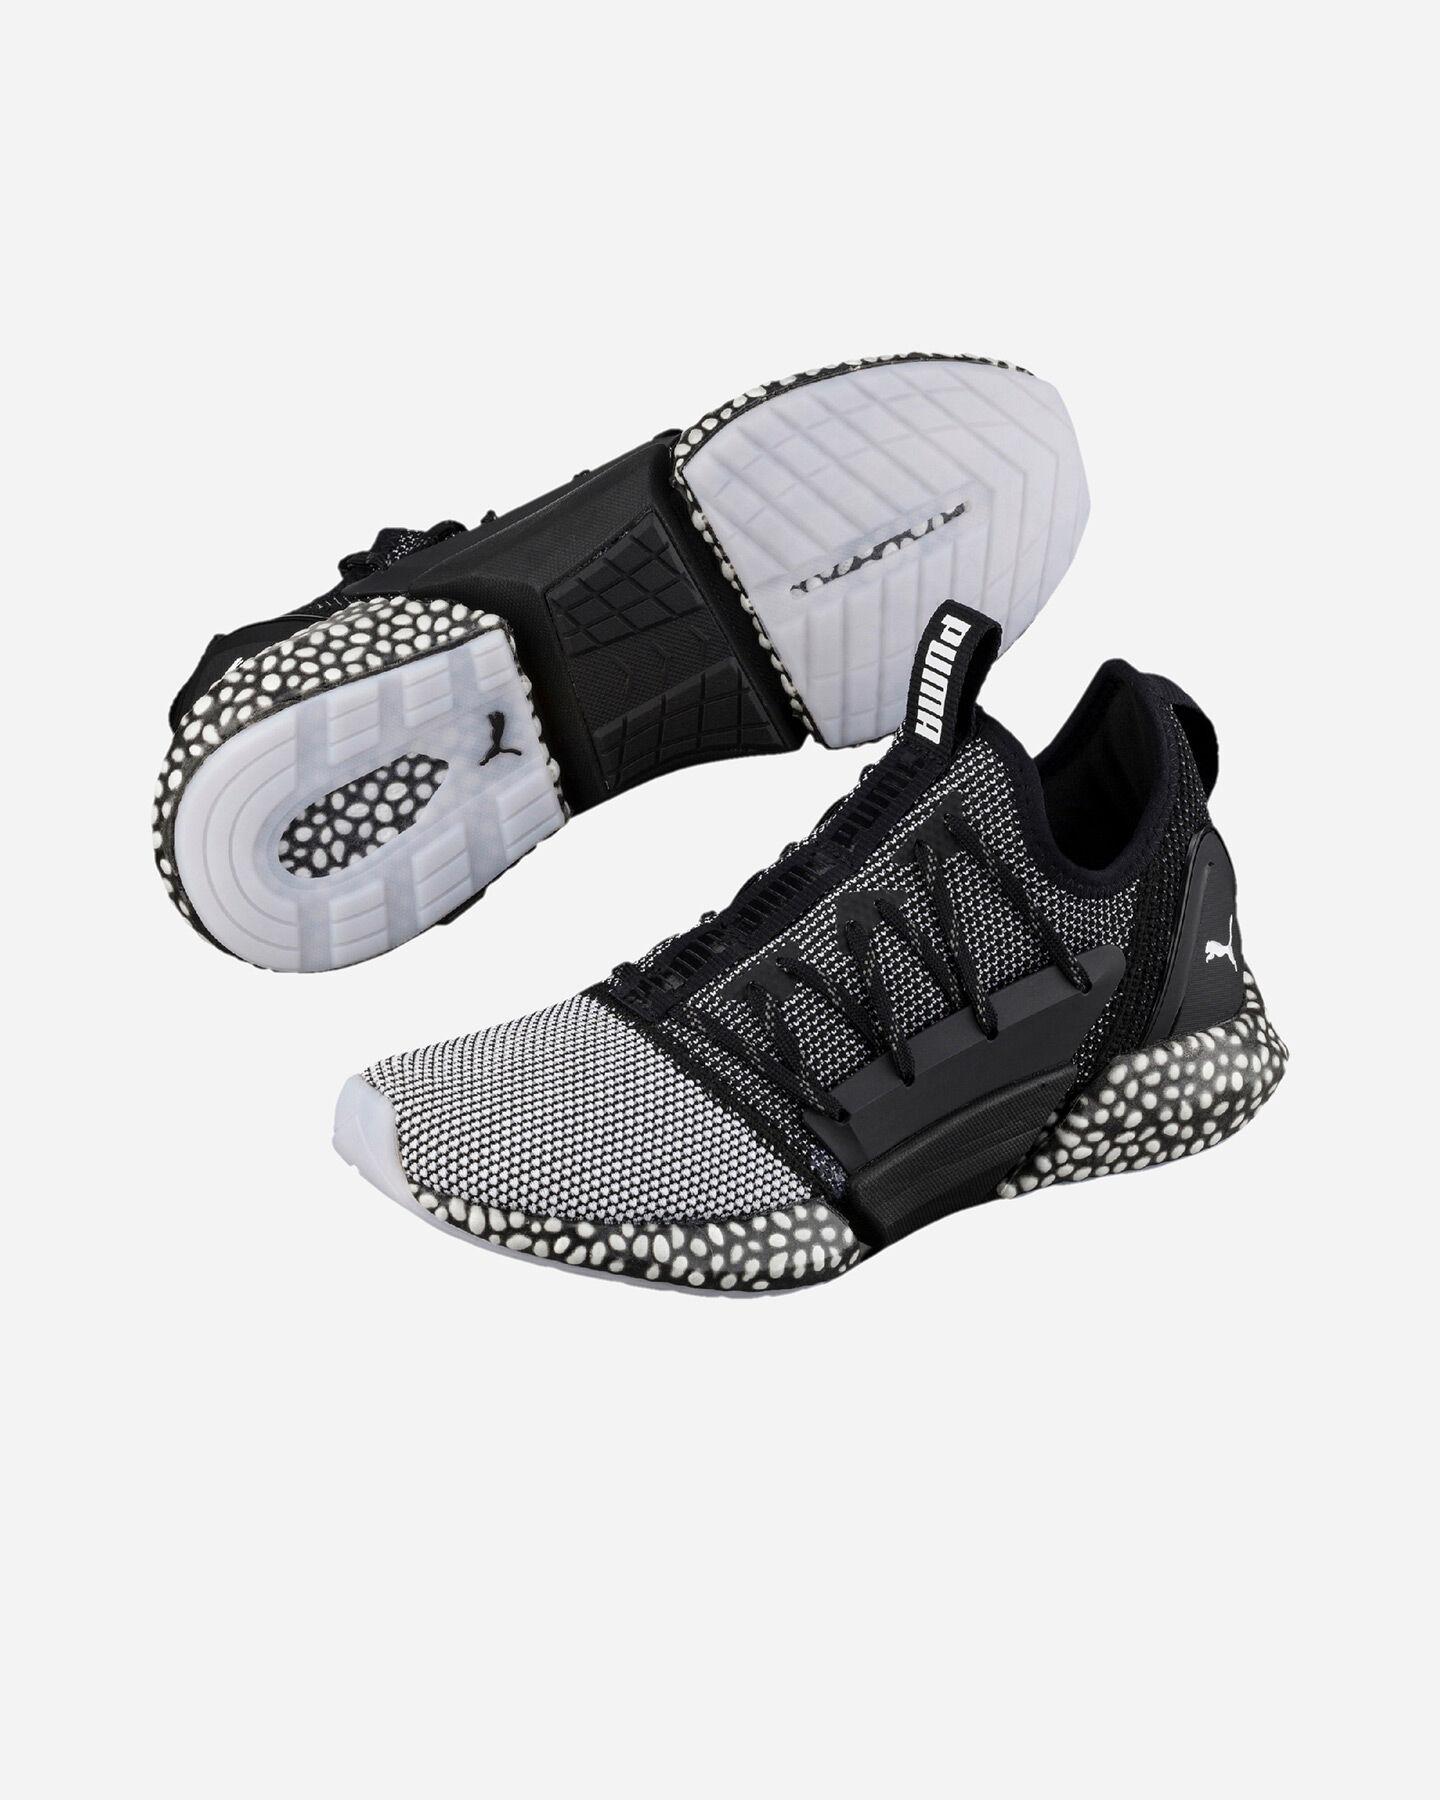 Sneakers 002 Scarpe Puma Cisalfa Hybrid Runner Su Rocket M 191592 6cqp1w0